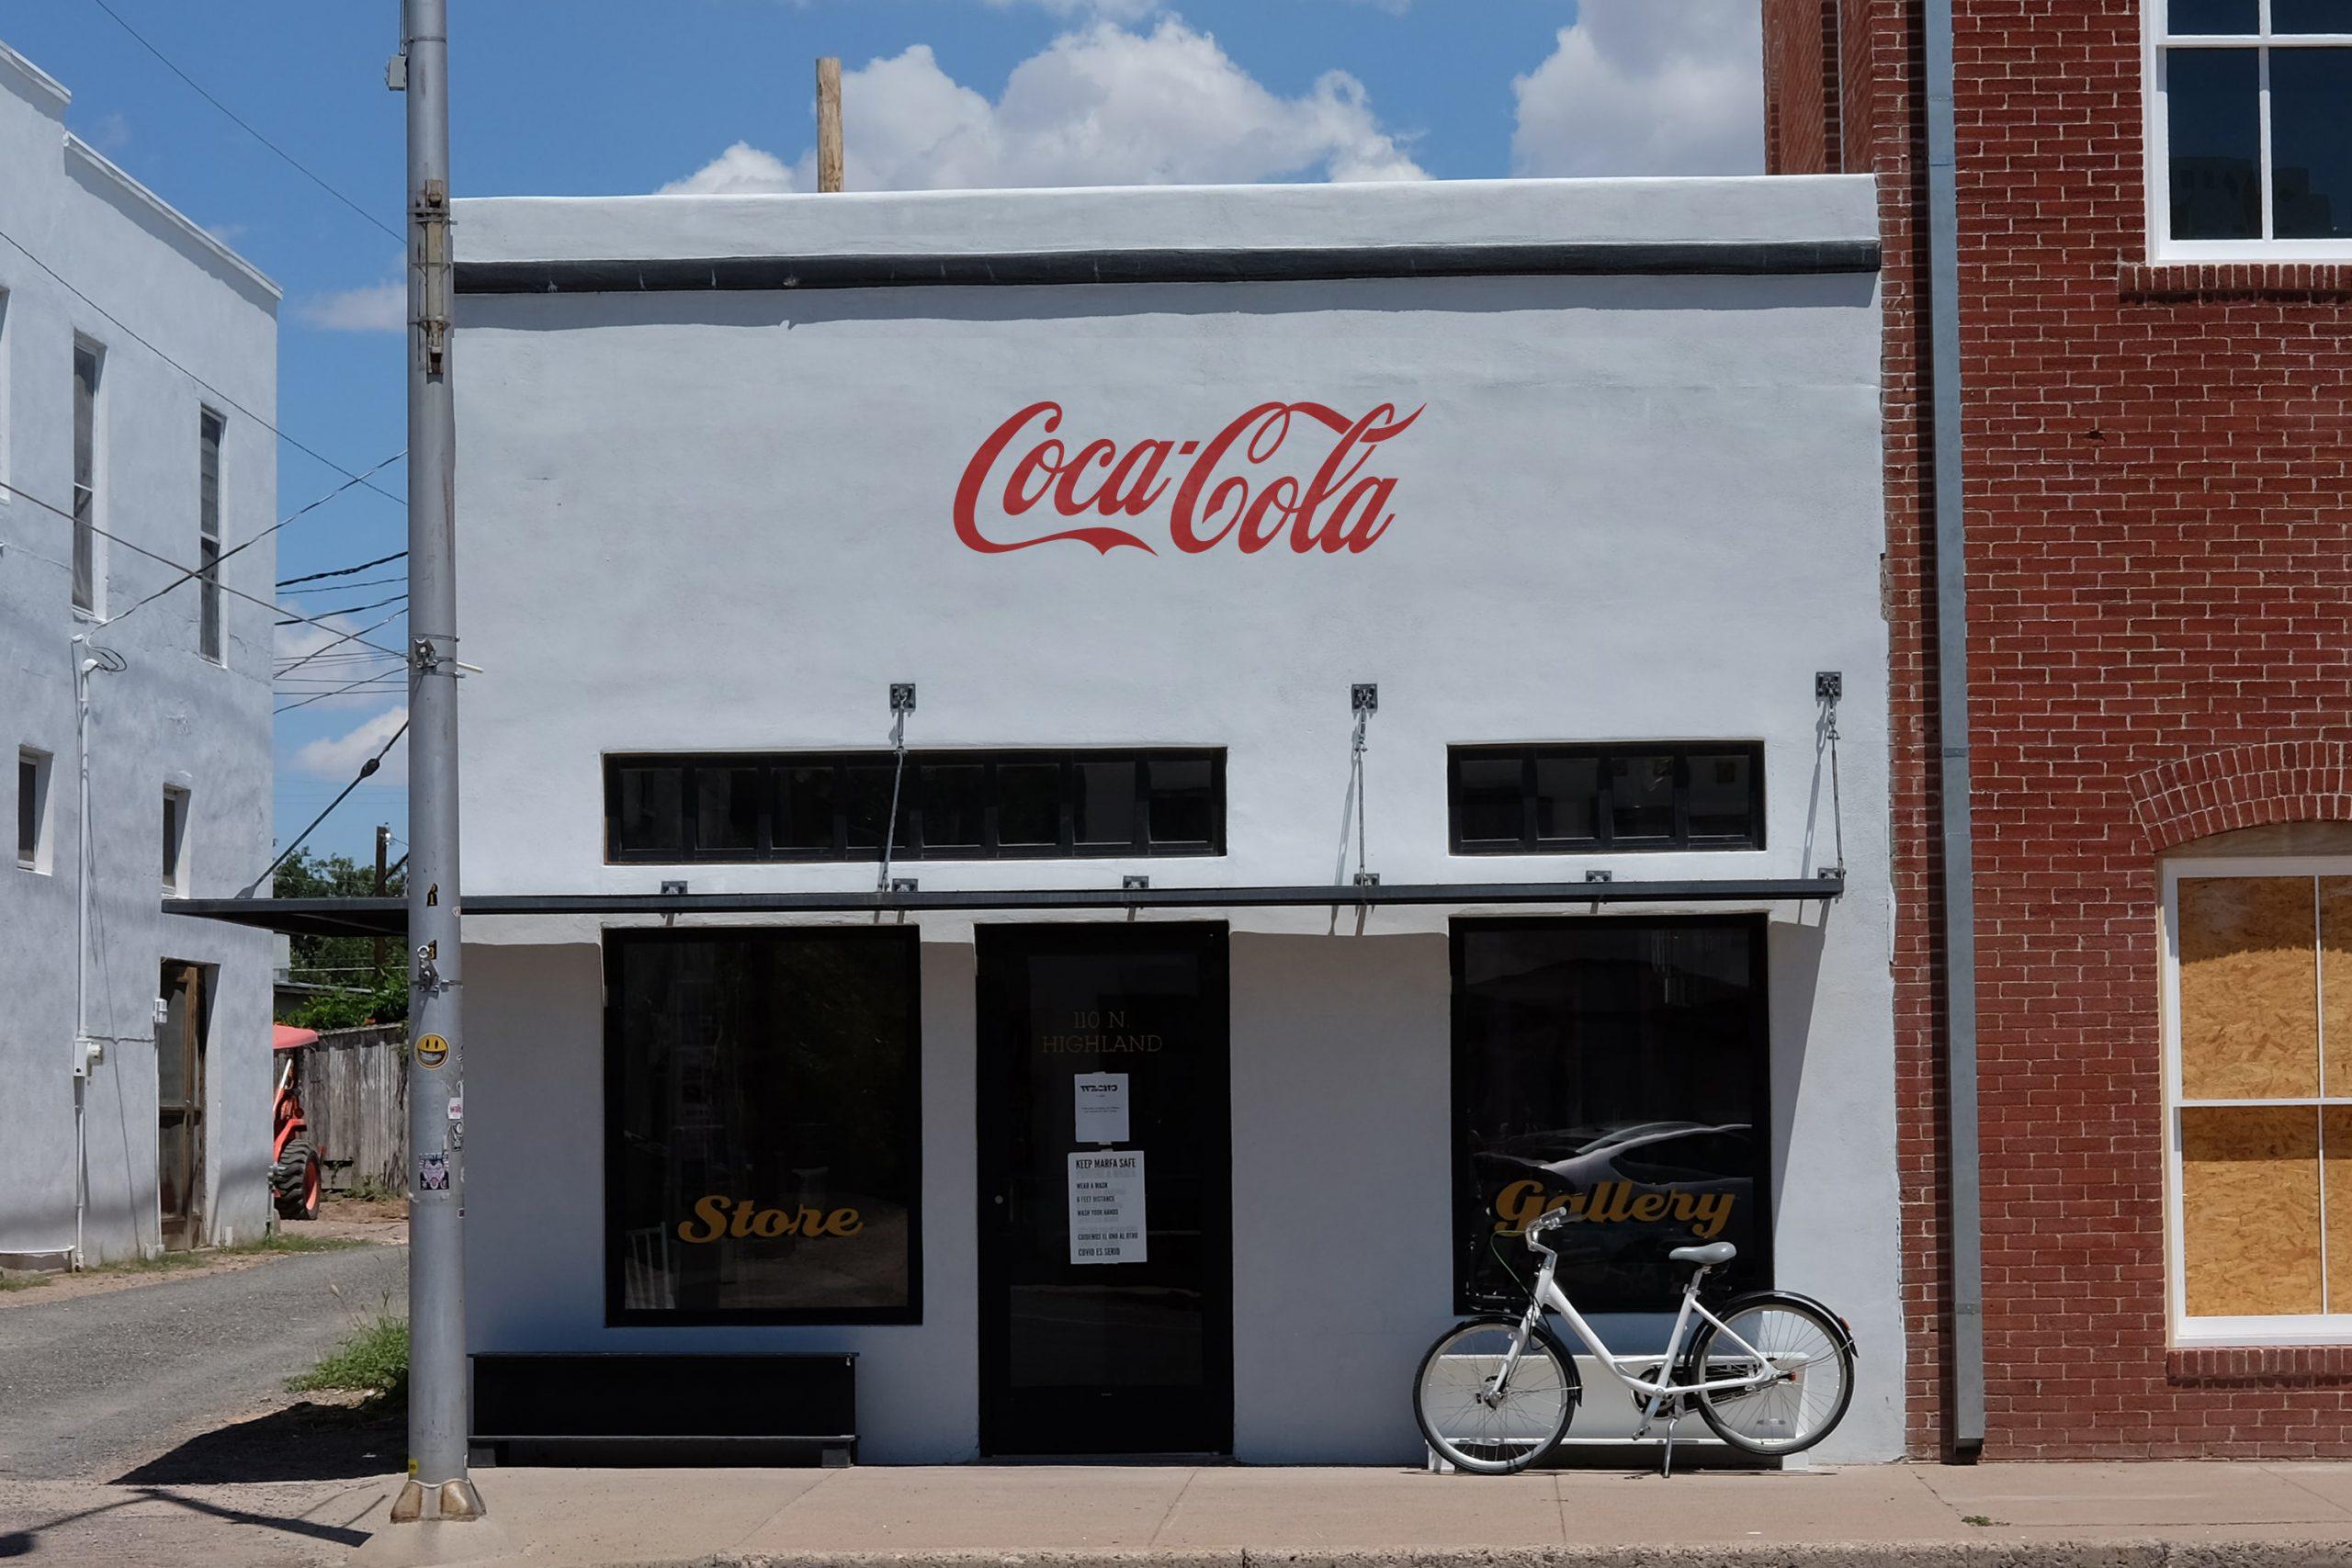 Free Corner Shop Realistic Logo Mockup